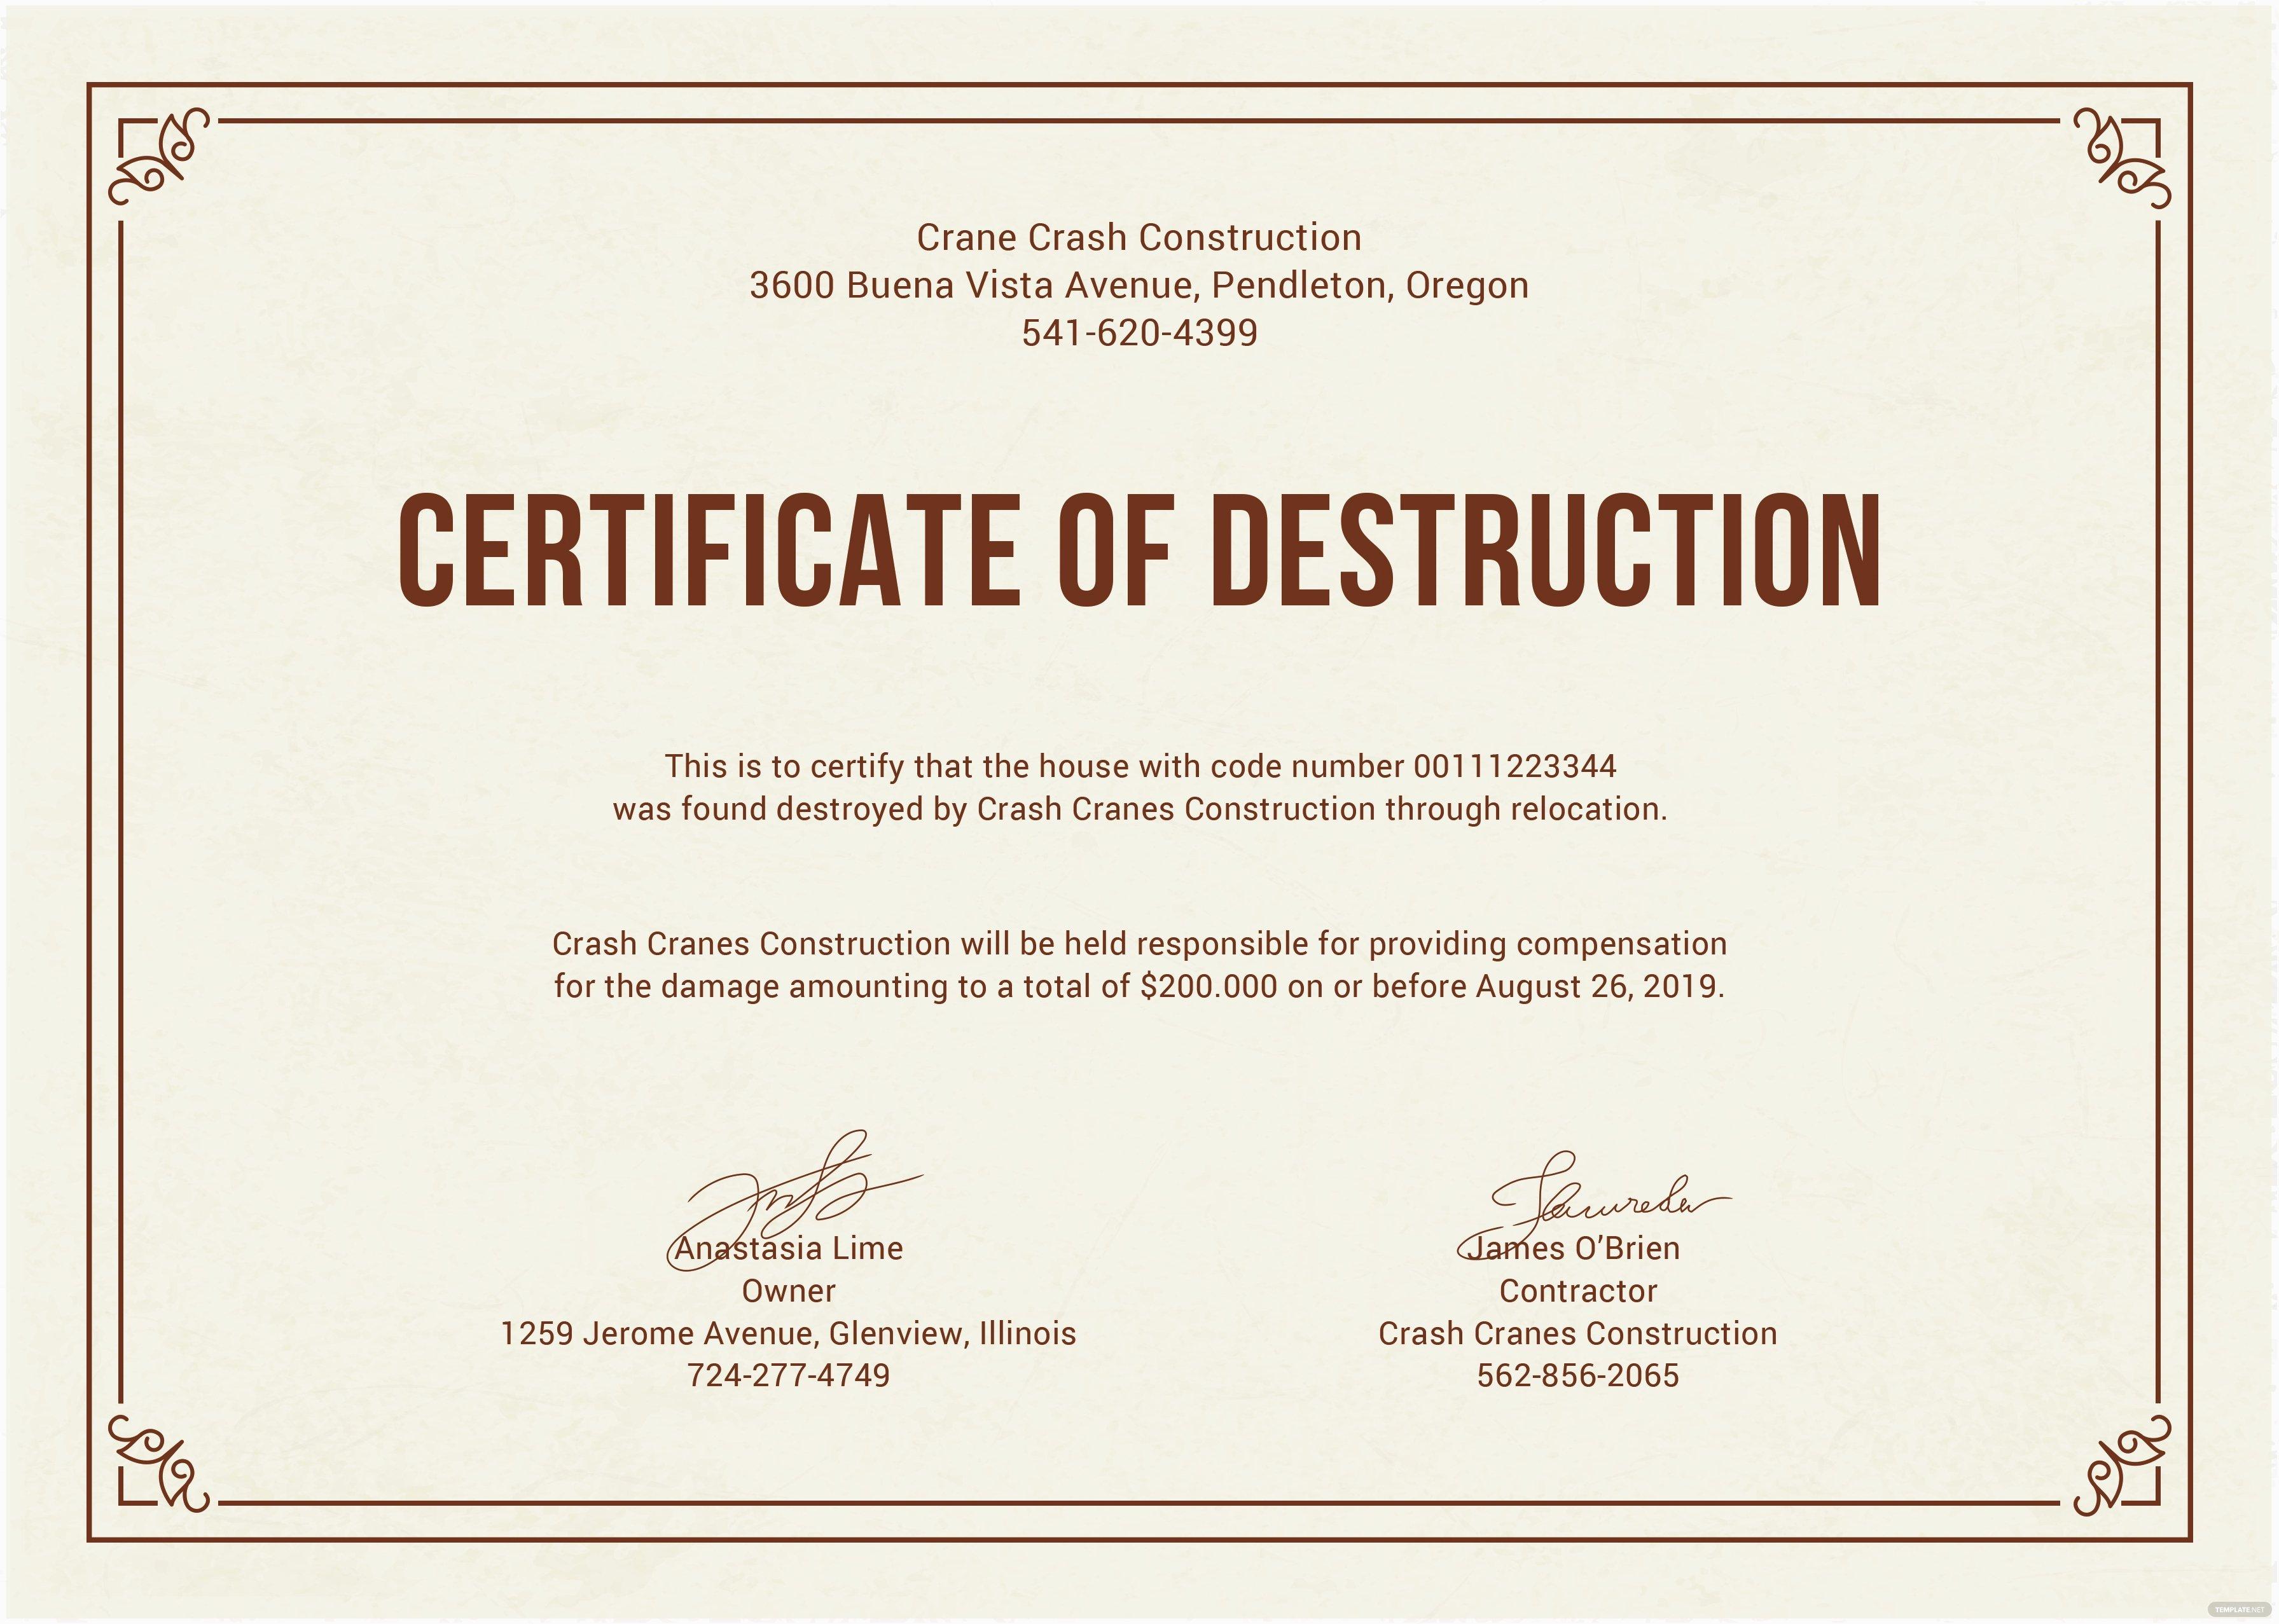 Hard Drive Destruction Certificate Template Lovely Free Certificate Of Destruction Template In Adobe